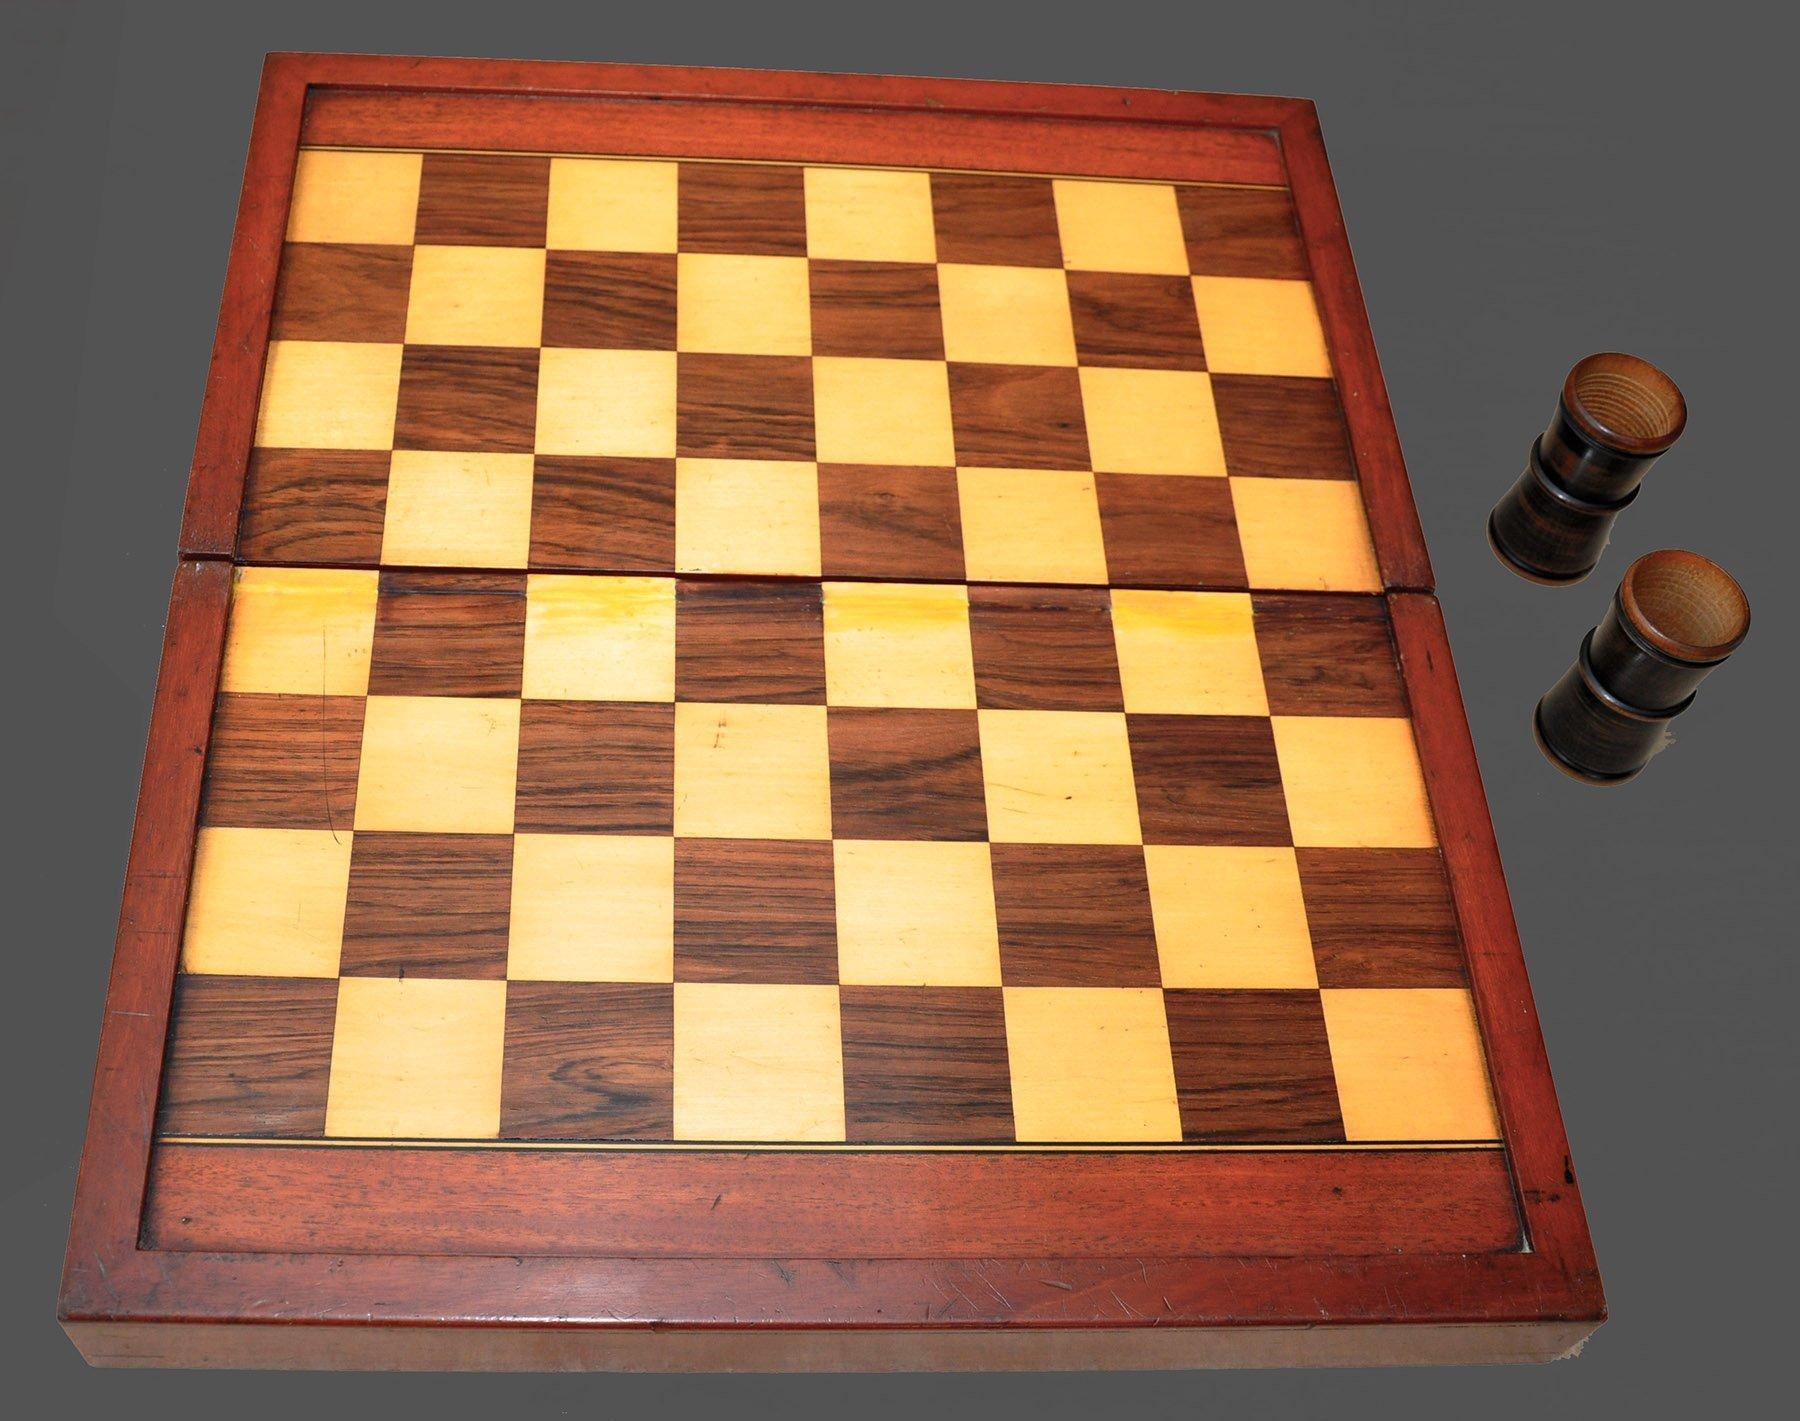 Antique Folding Chess Backgammon Board and Box